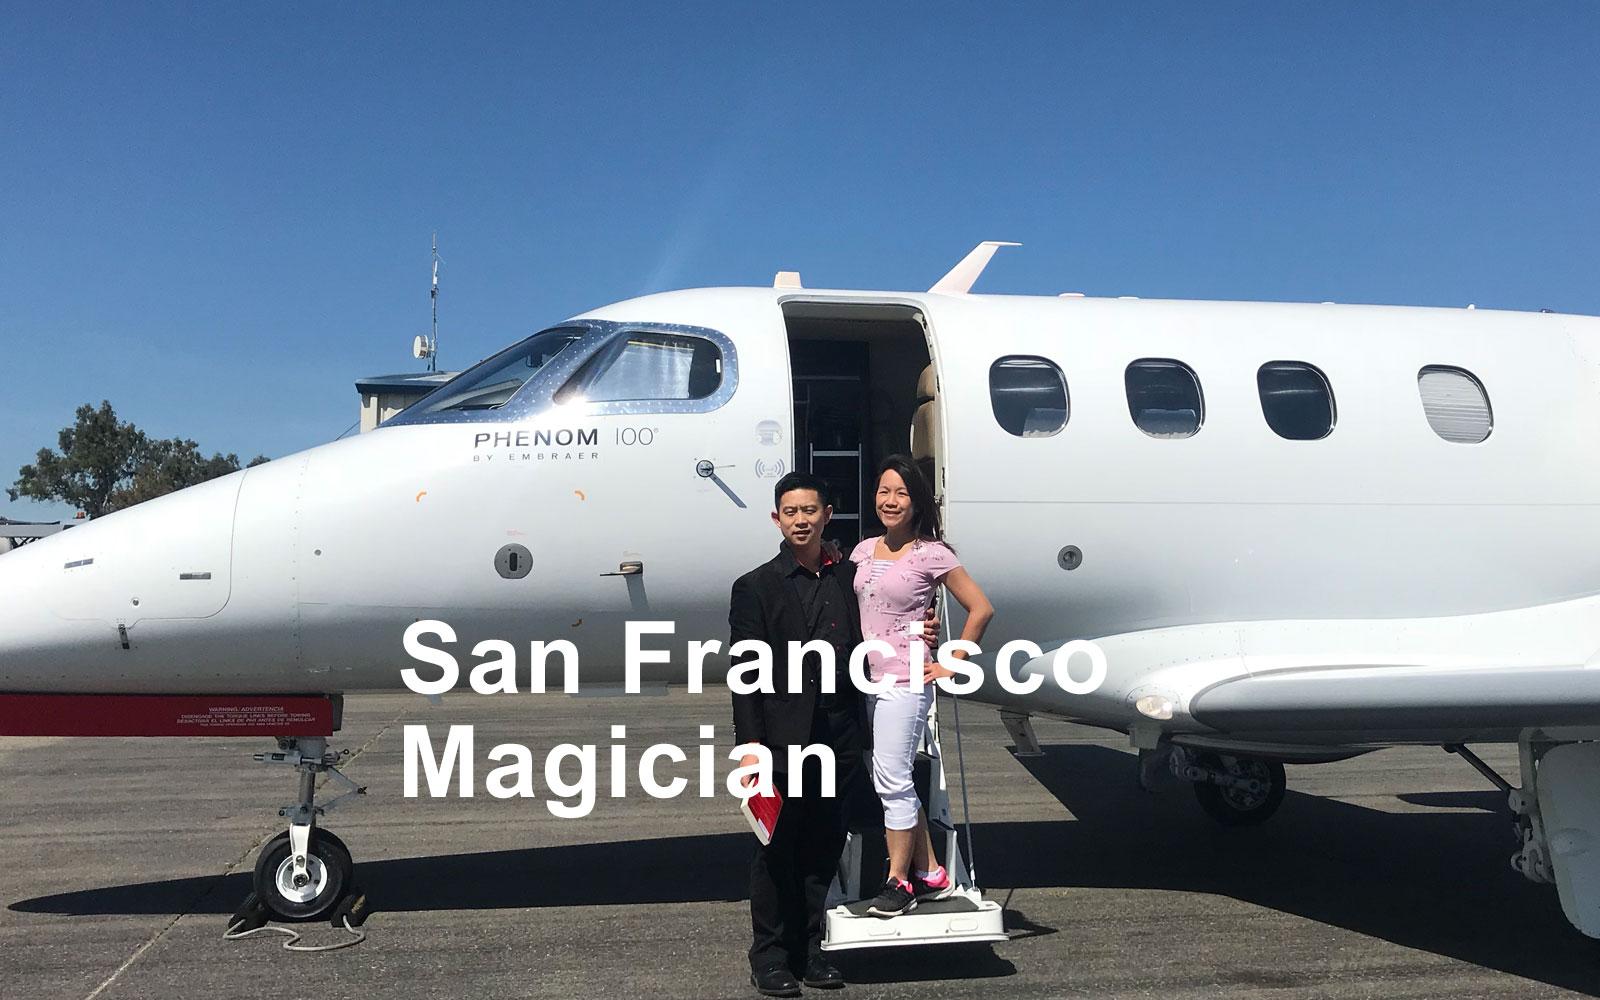 San Francisco Magic Show